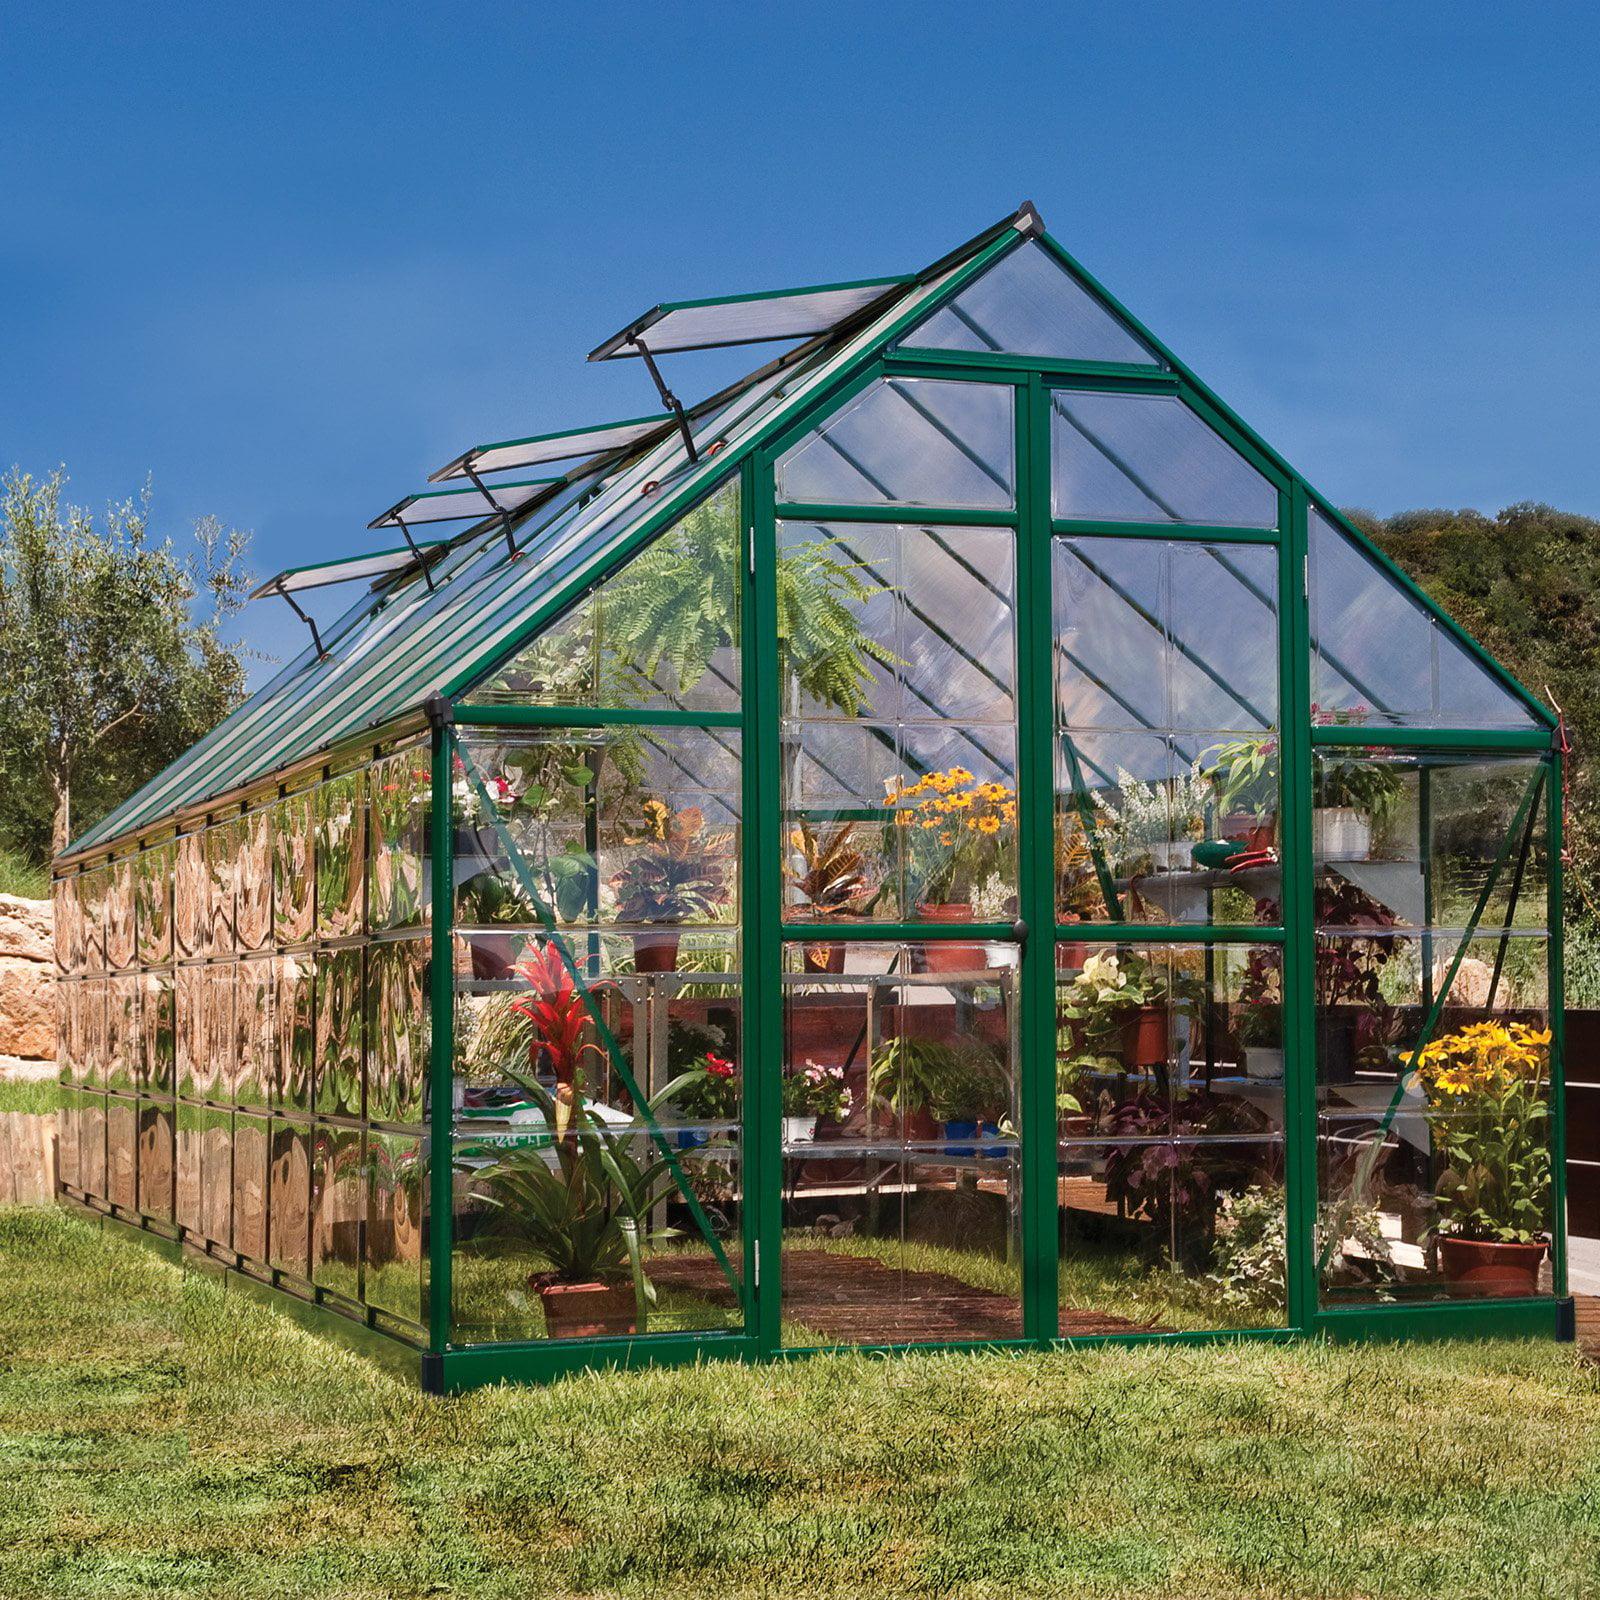 Green Balance 8' x 20' Greenhouse by Palram